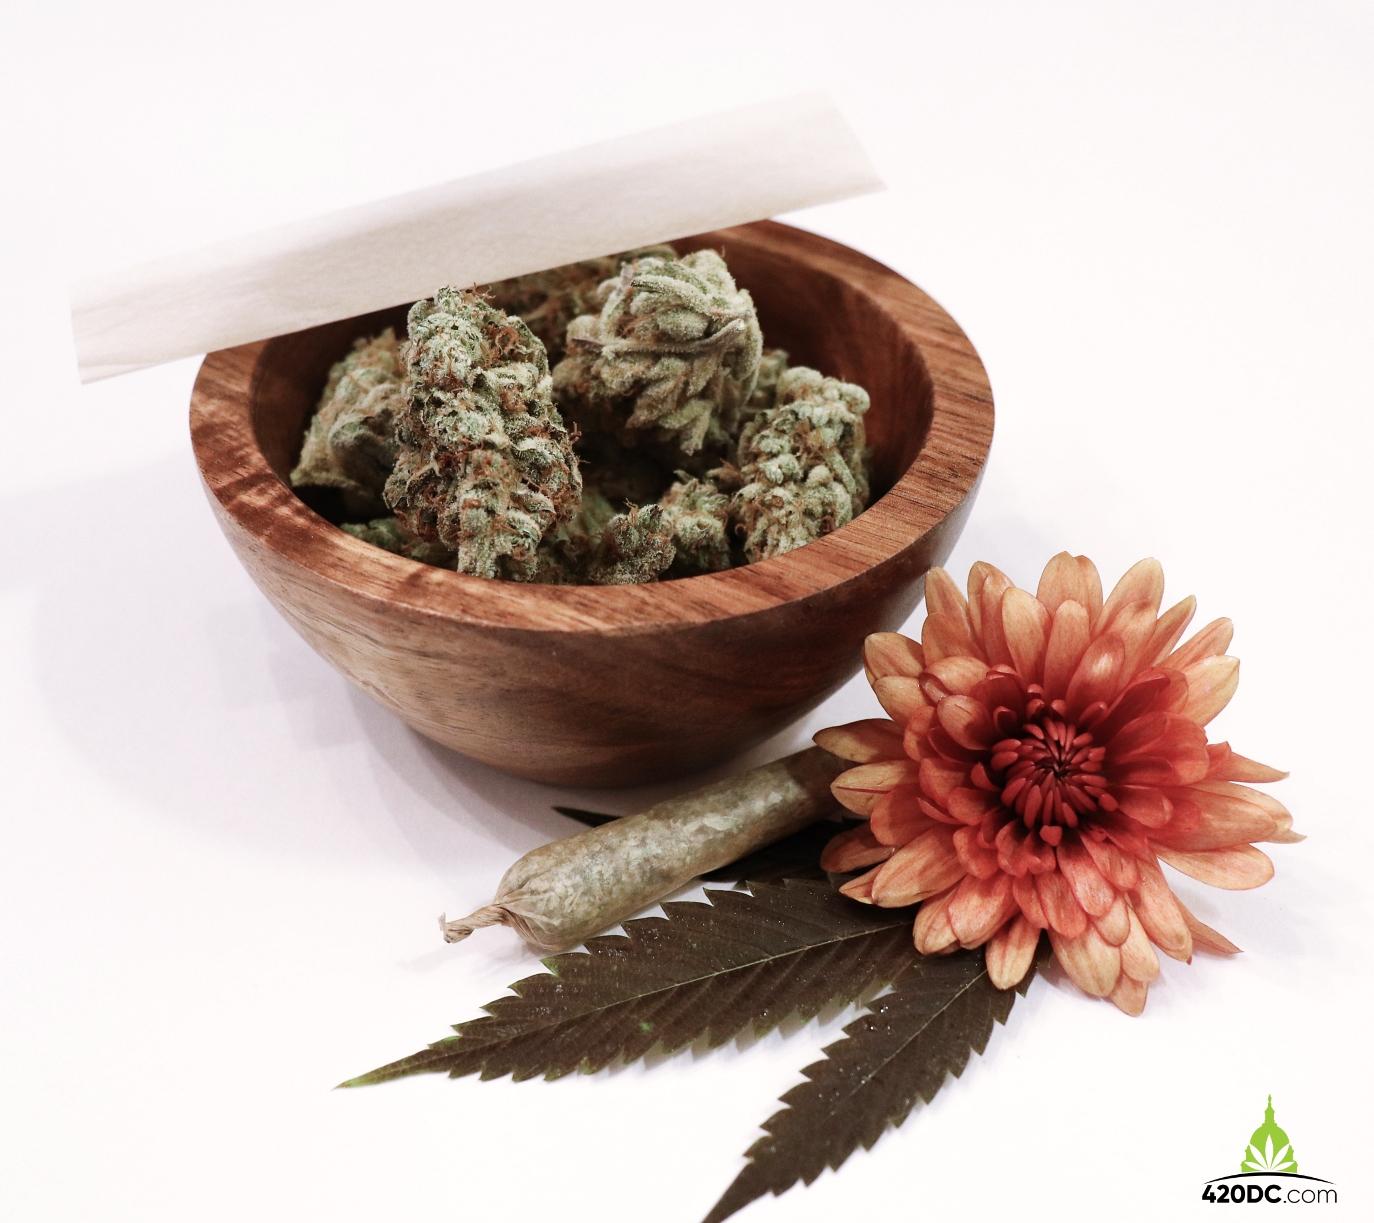 Medical Marijuana, Columbia Care